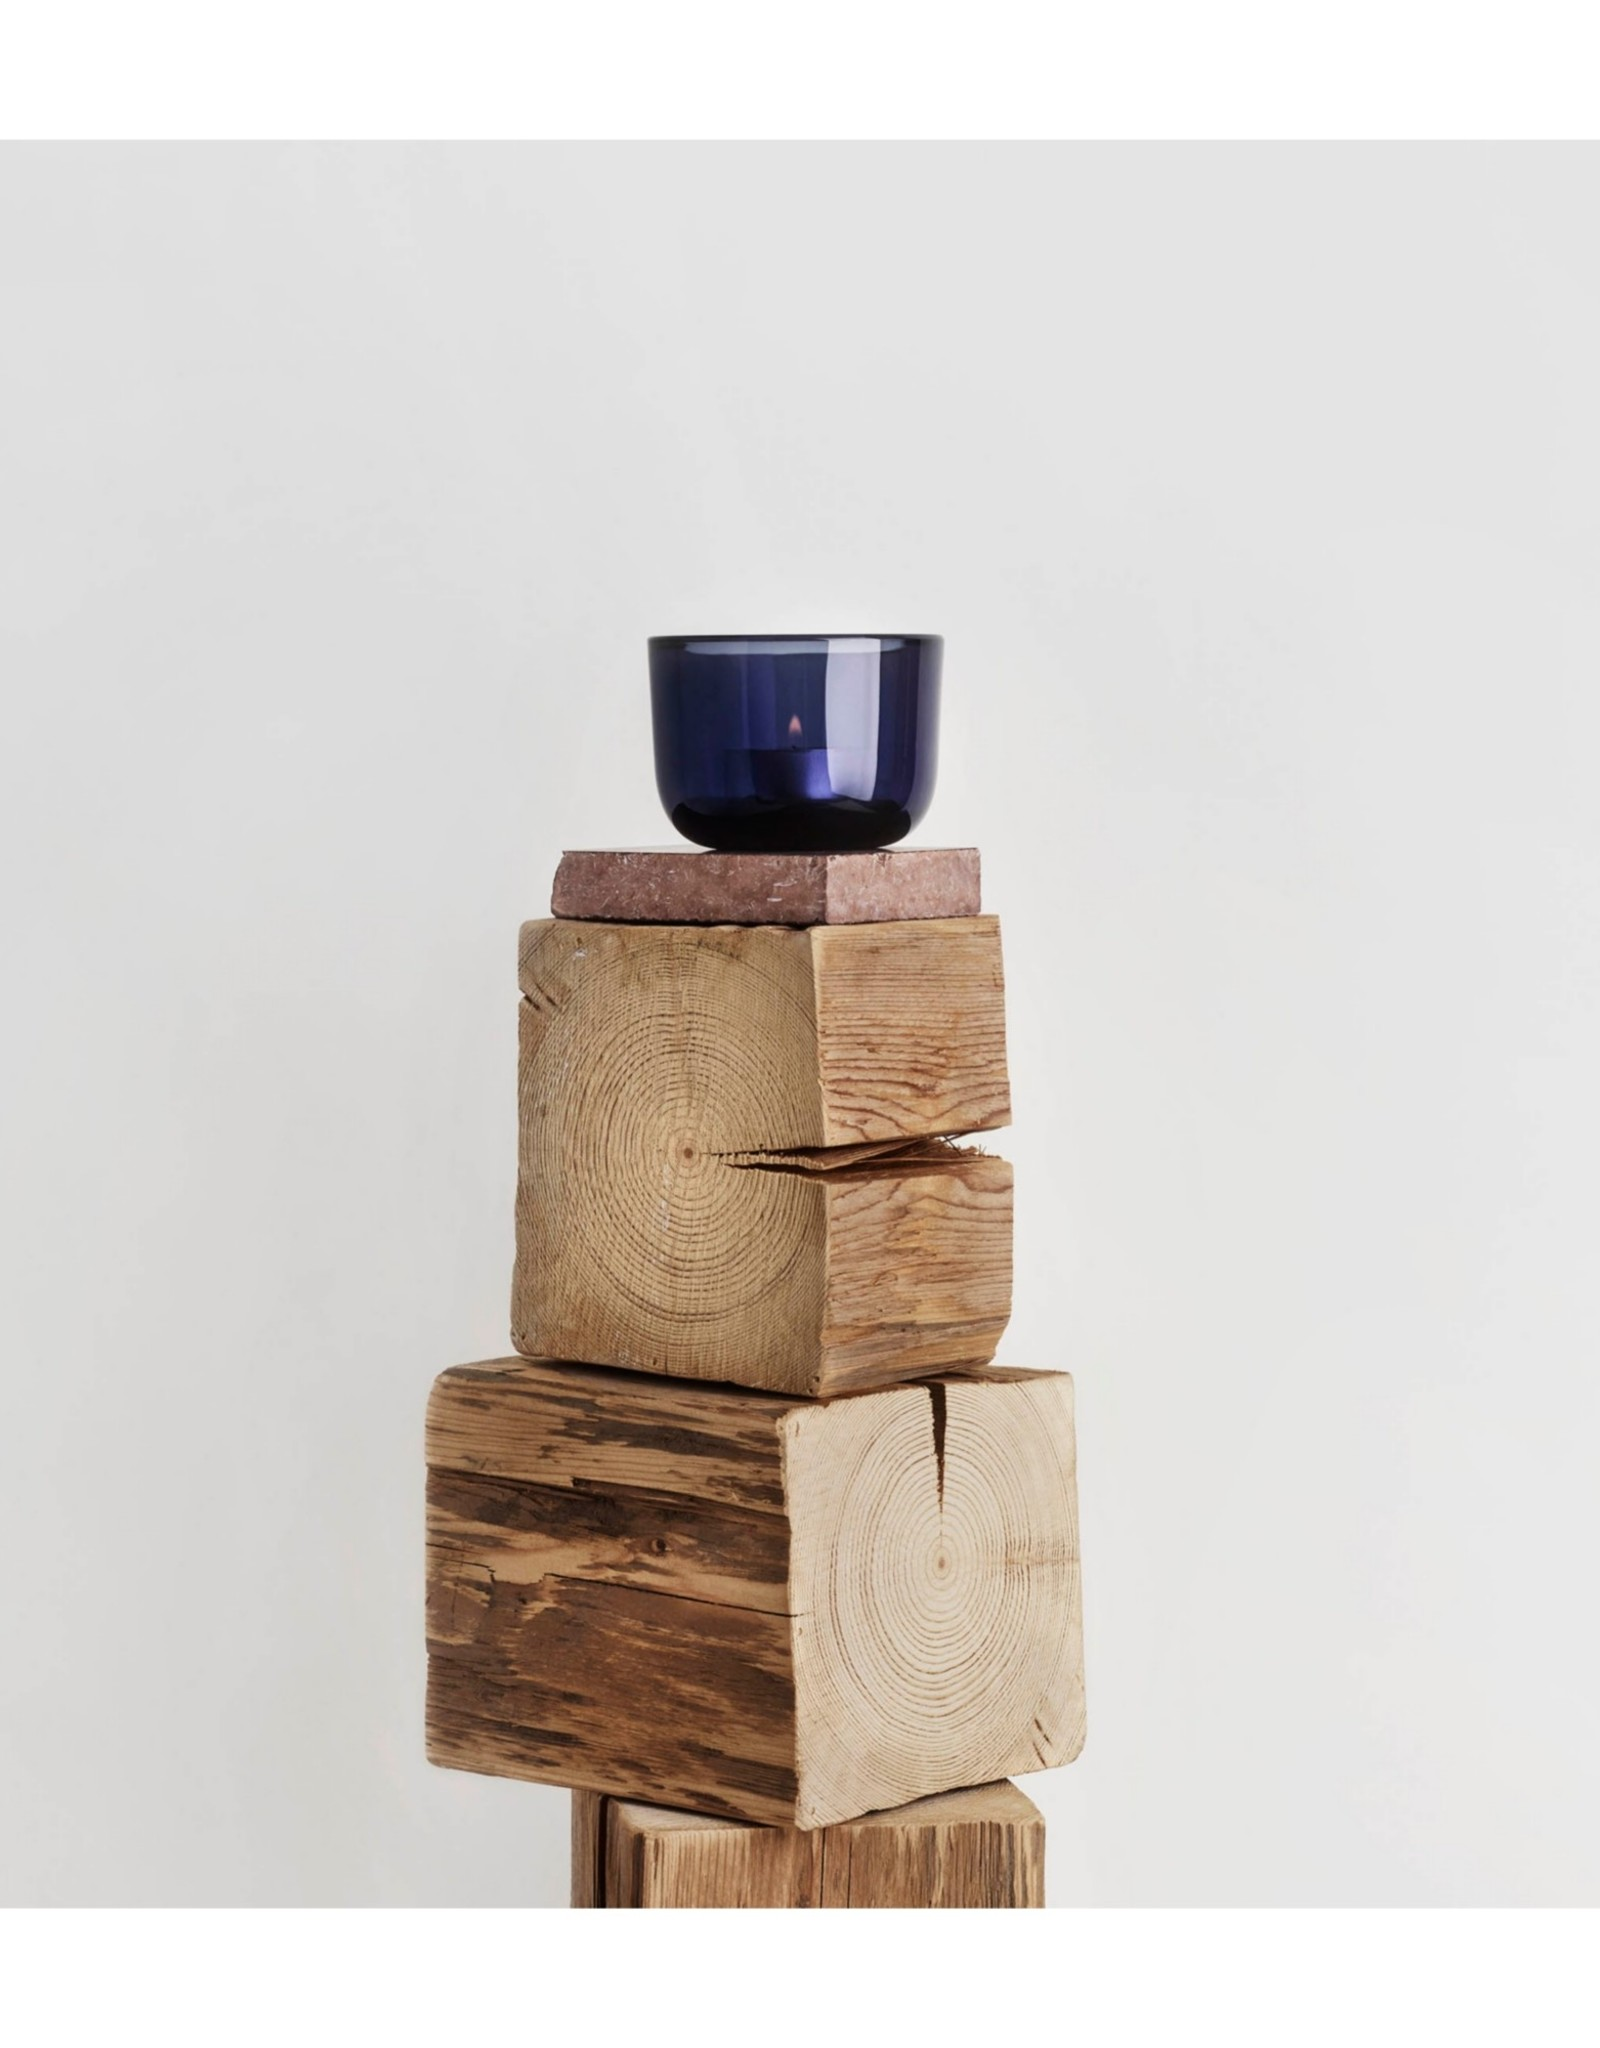 Iittala Iittala Valkea Waxinelichthouder / Sfeerlicht 60mm Regenblauw